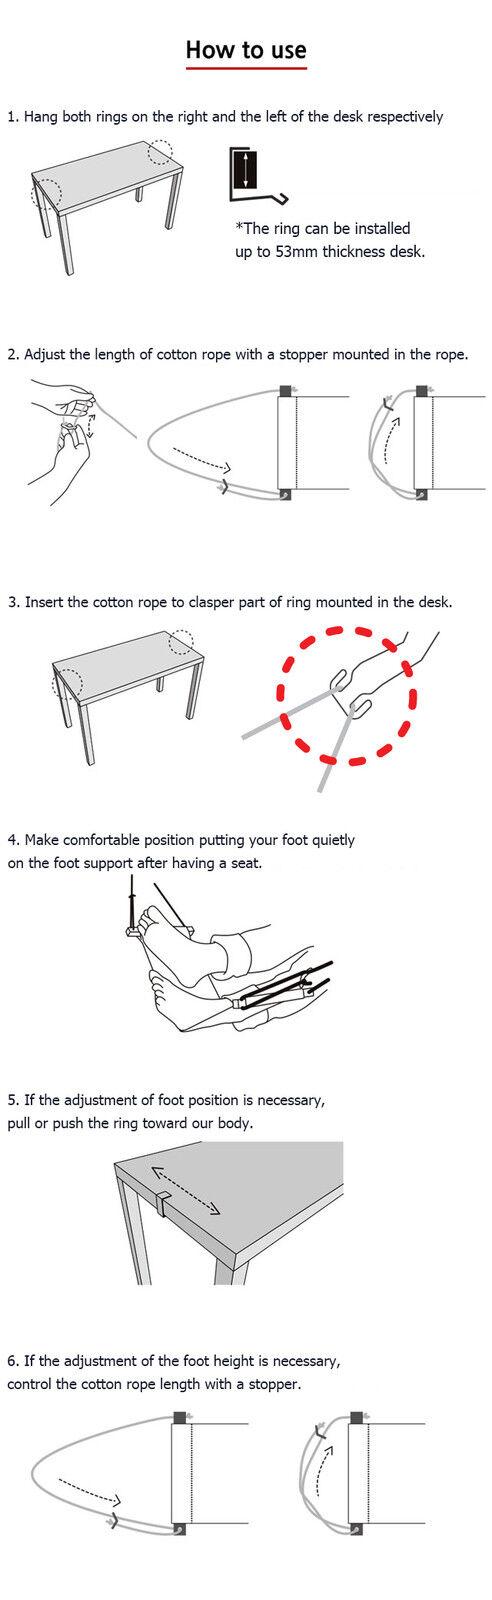 FUUT Desk Desk Desk Foot Hammock For comfort your Feet Small Mini office foot Rest Stand abb947